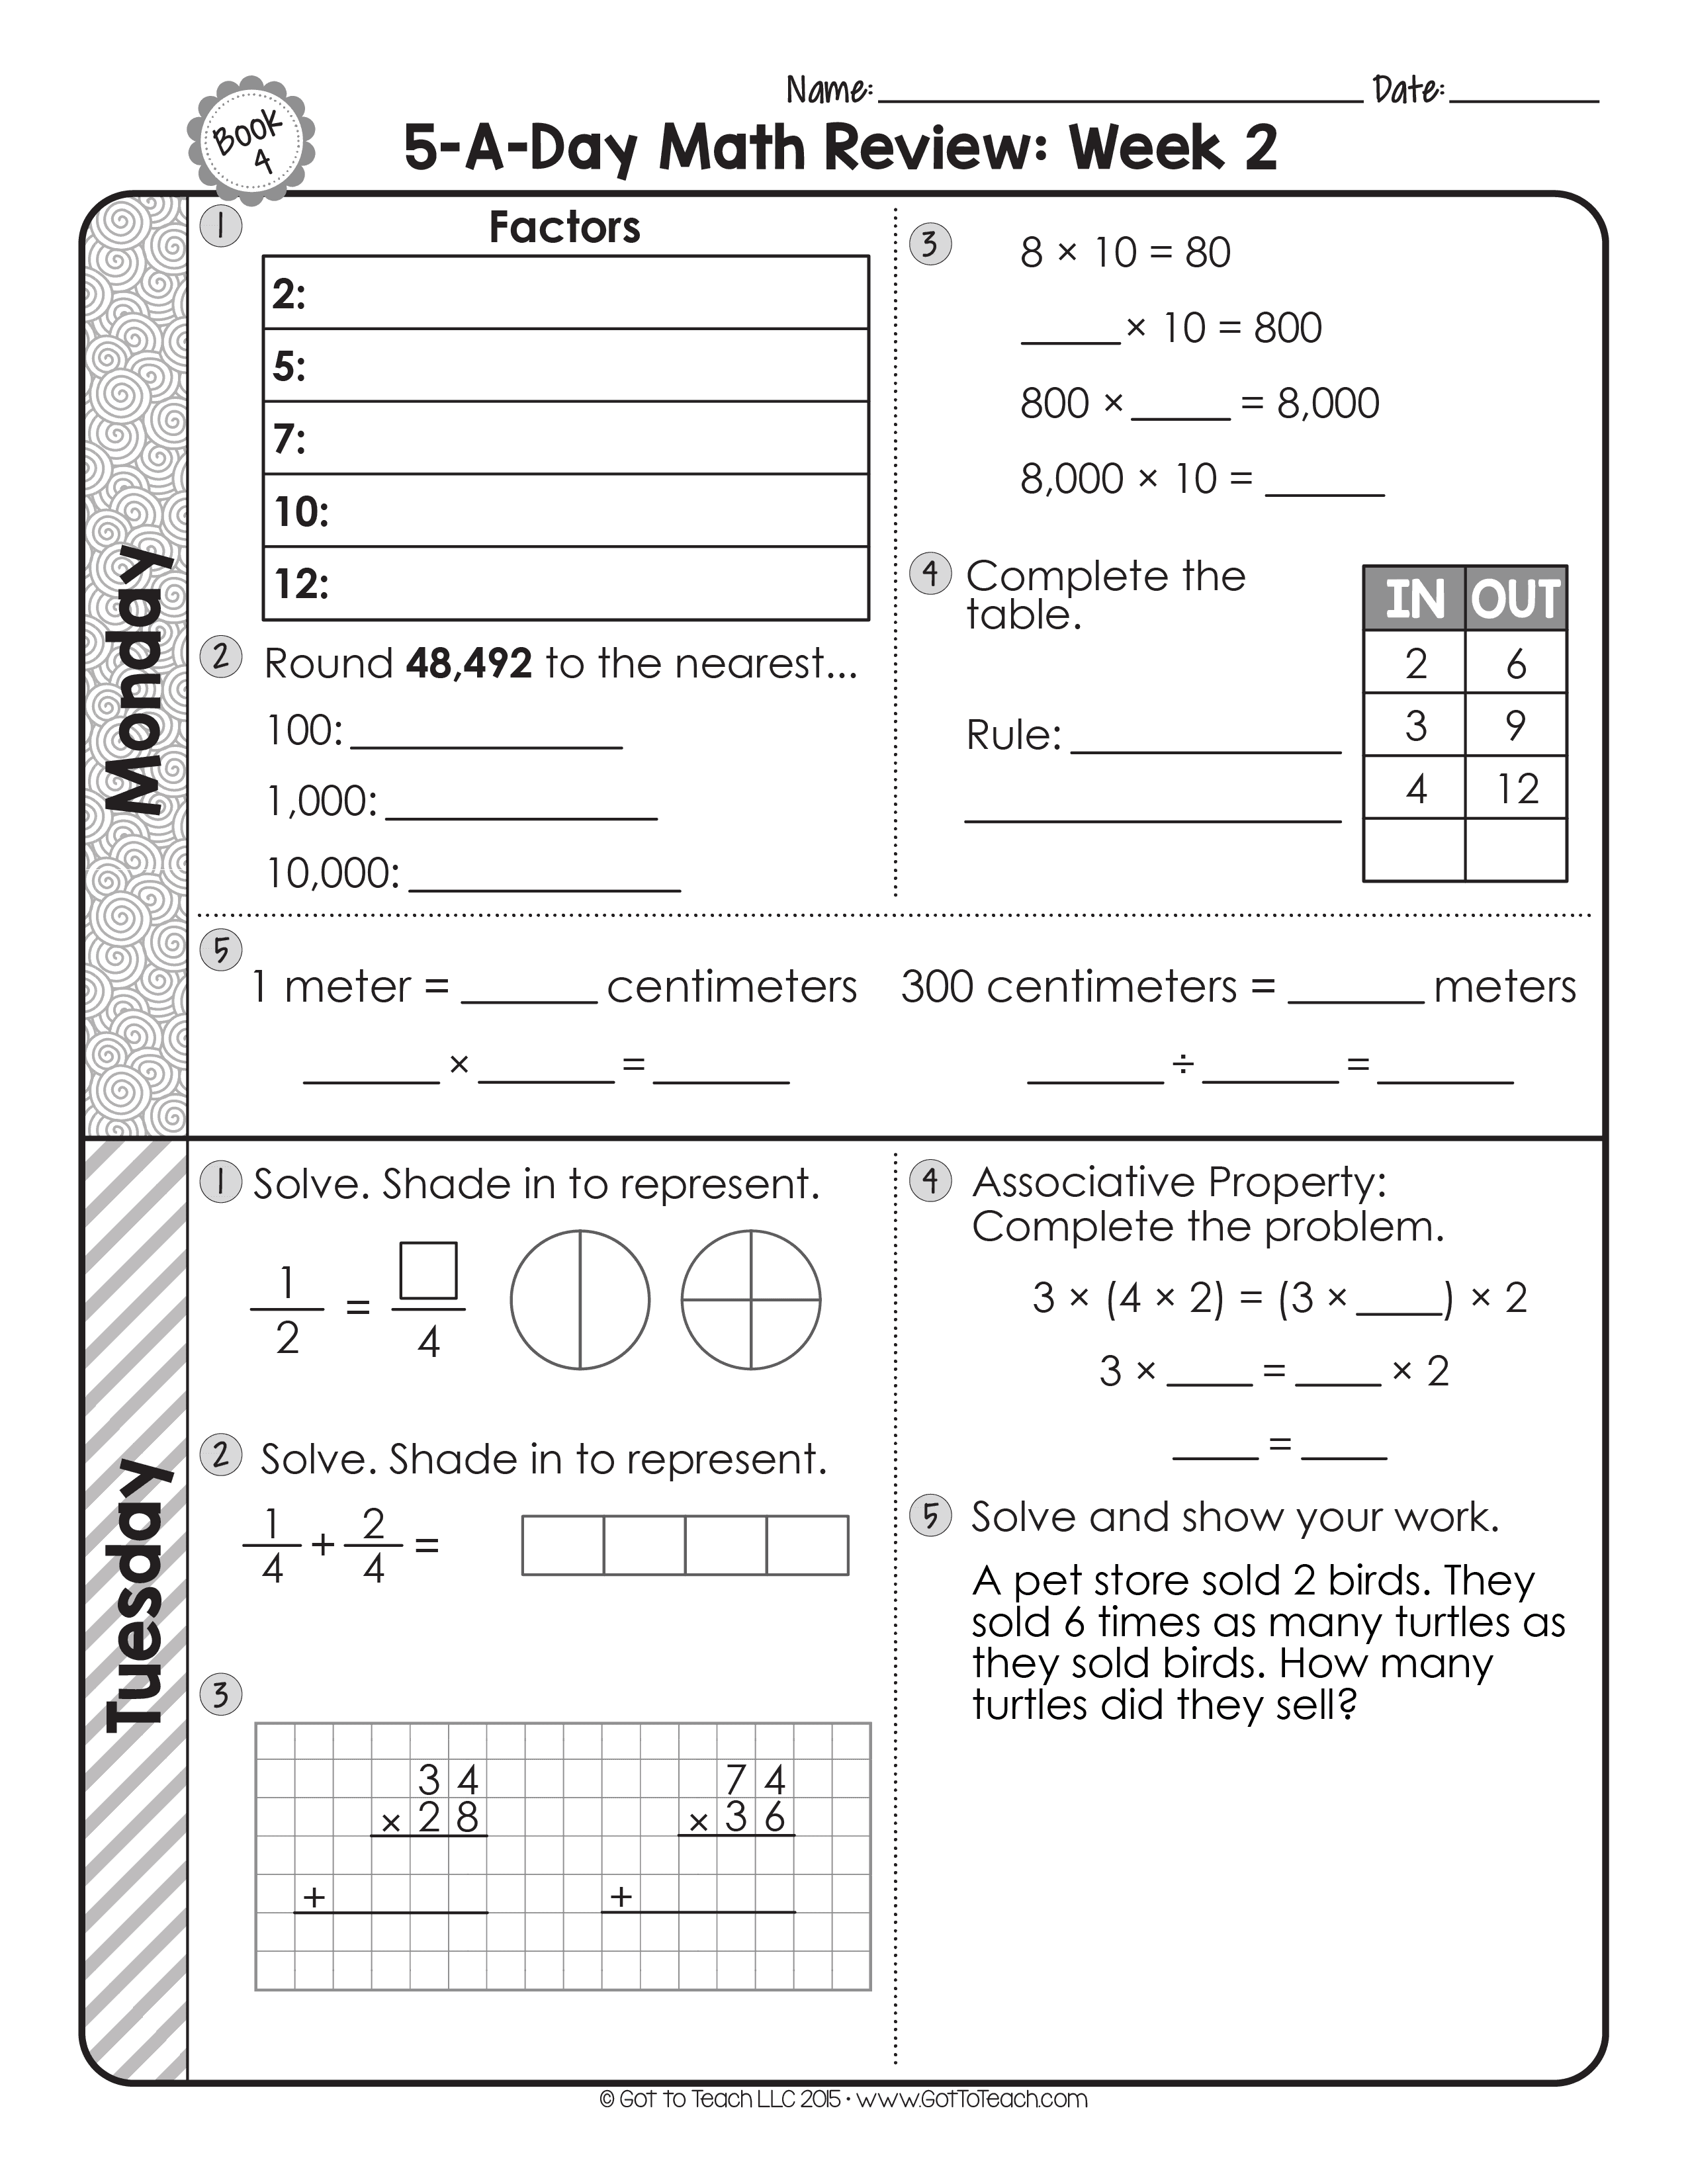 4th grade daily math spiral review teacher thrive. Black Bedroom Furniture Sets. Home Design Ideas